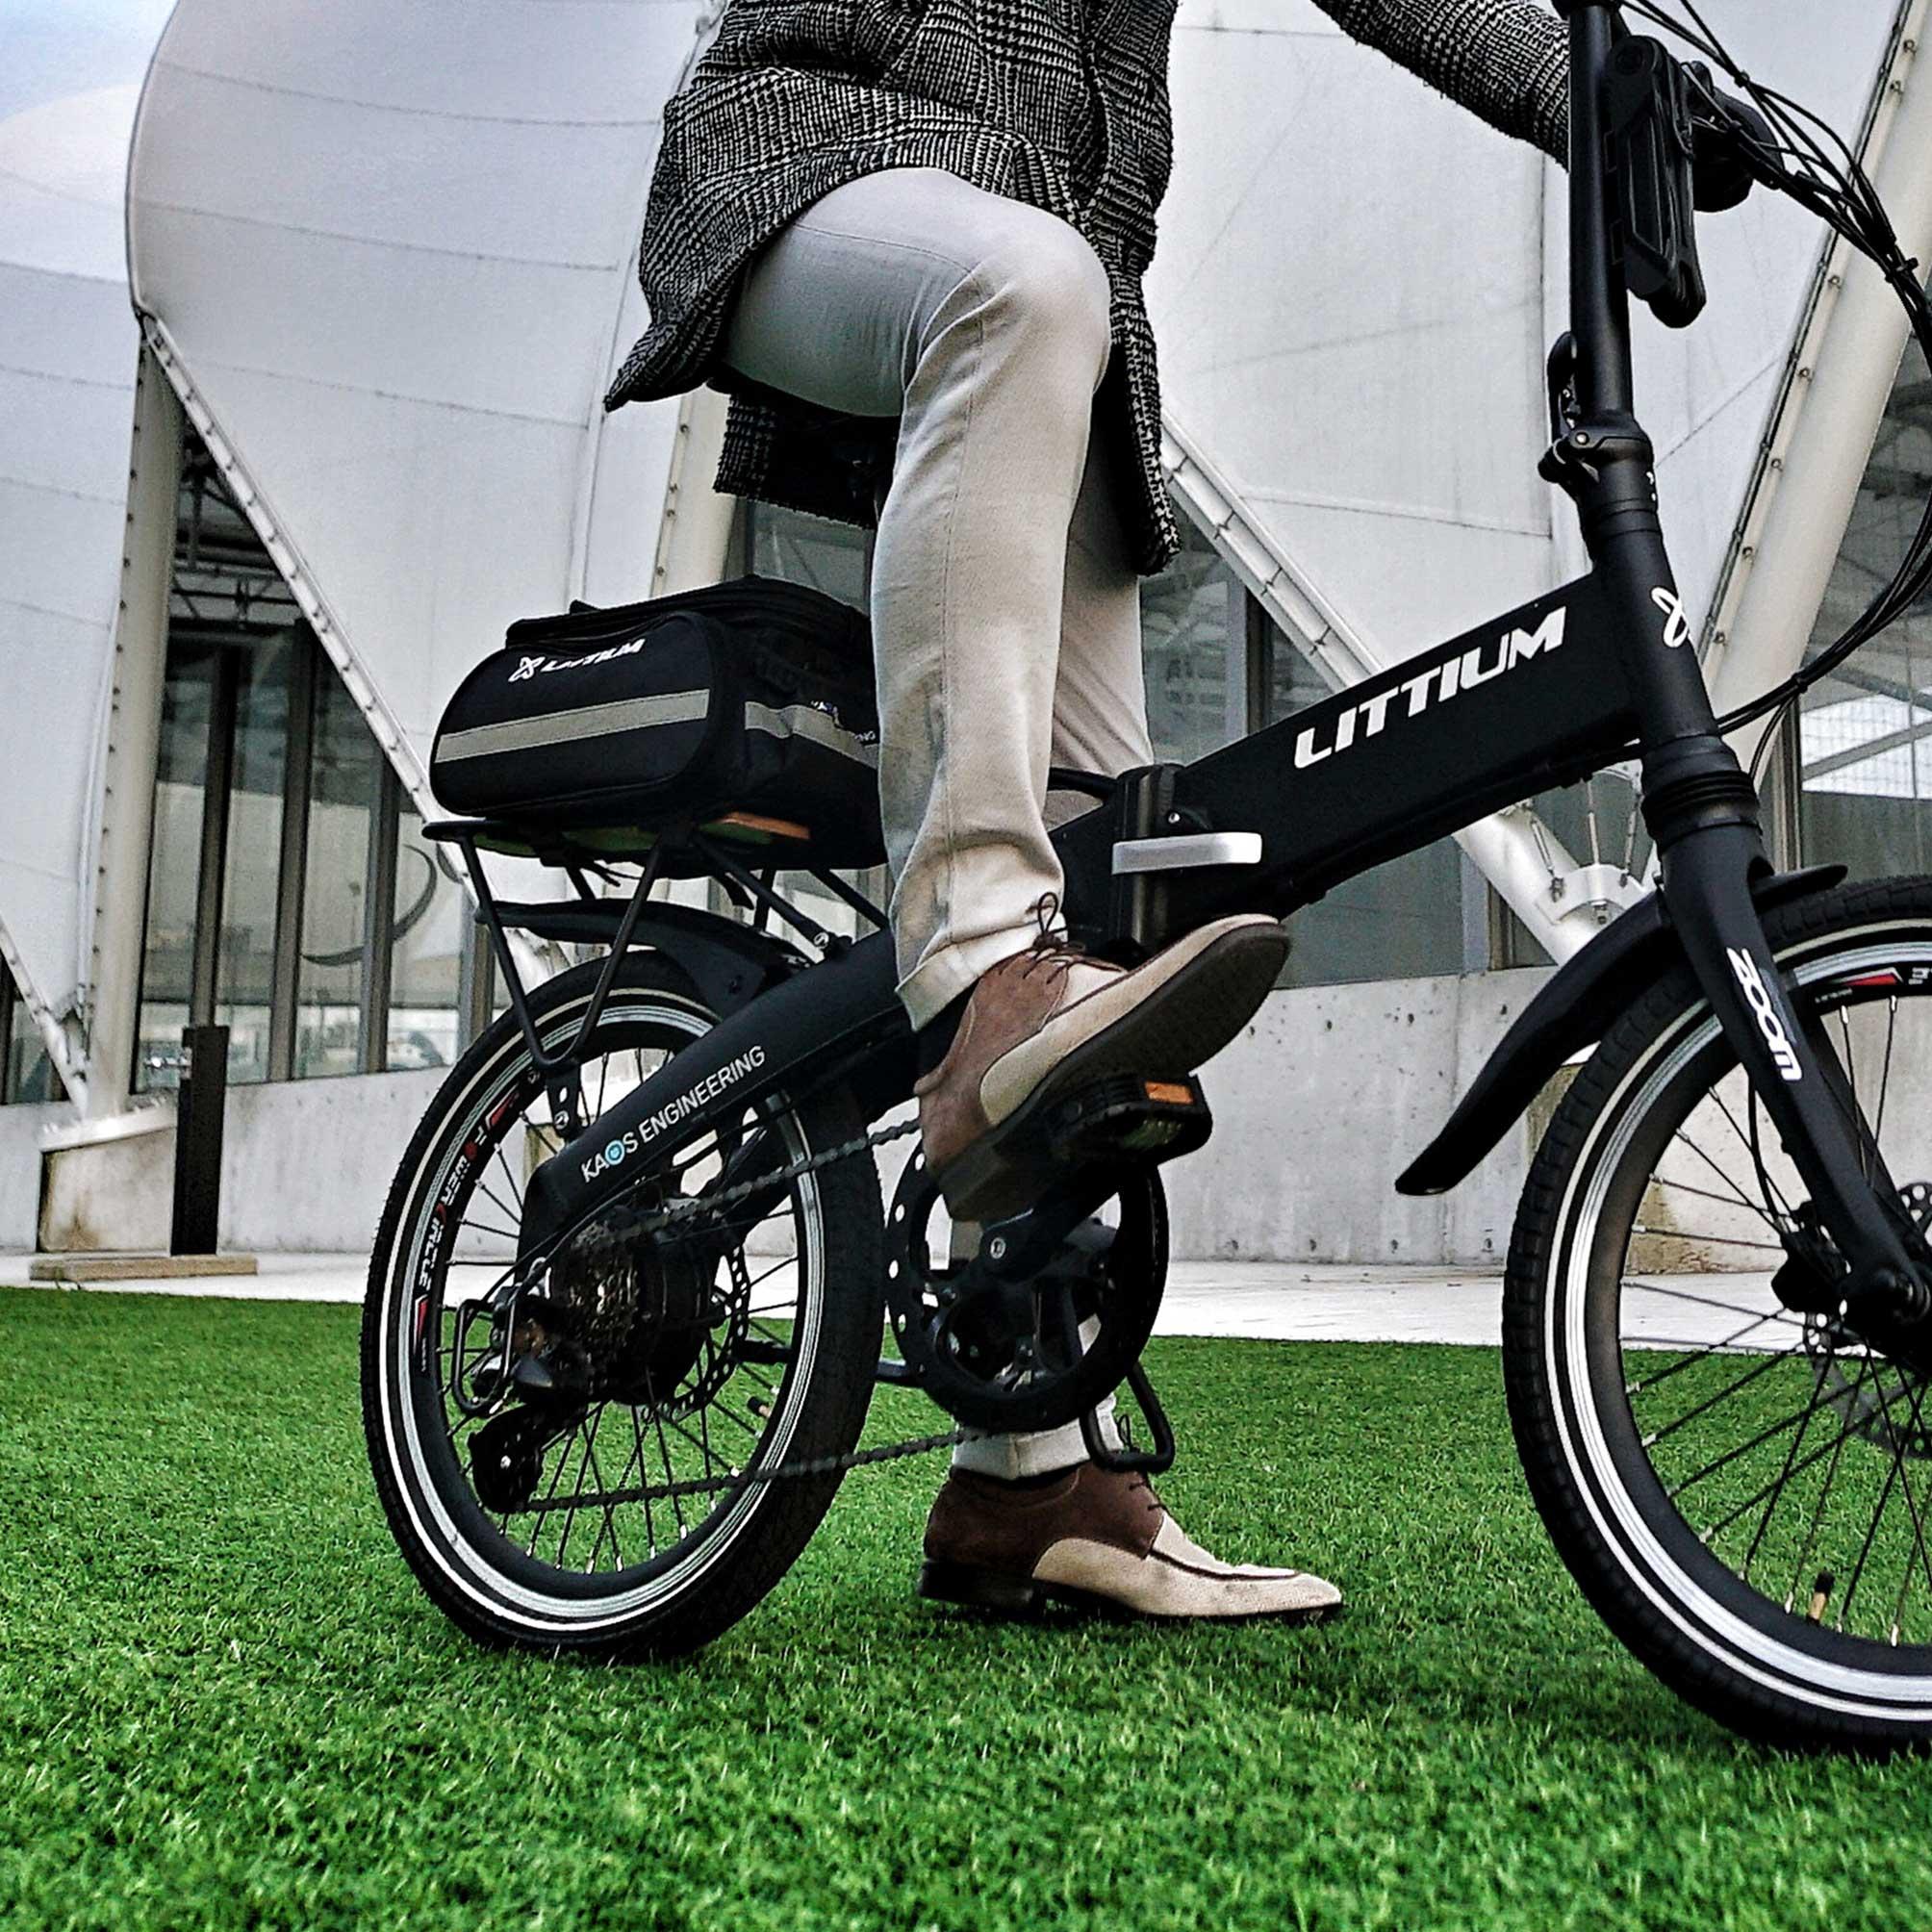 littium accesorios bicicleta bolsa parrilla